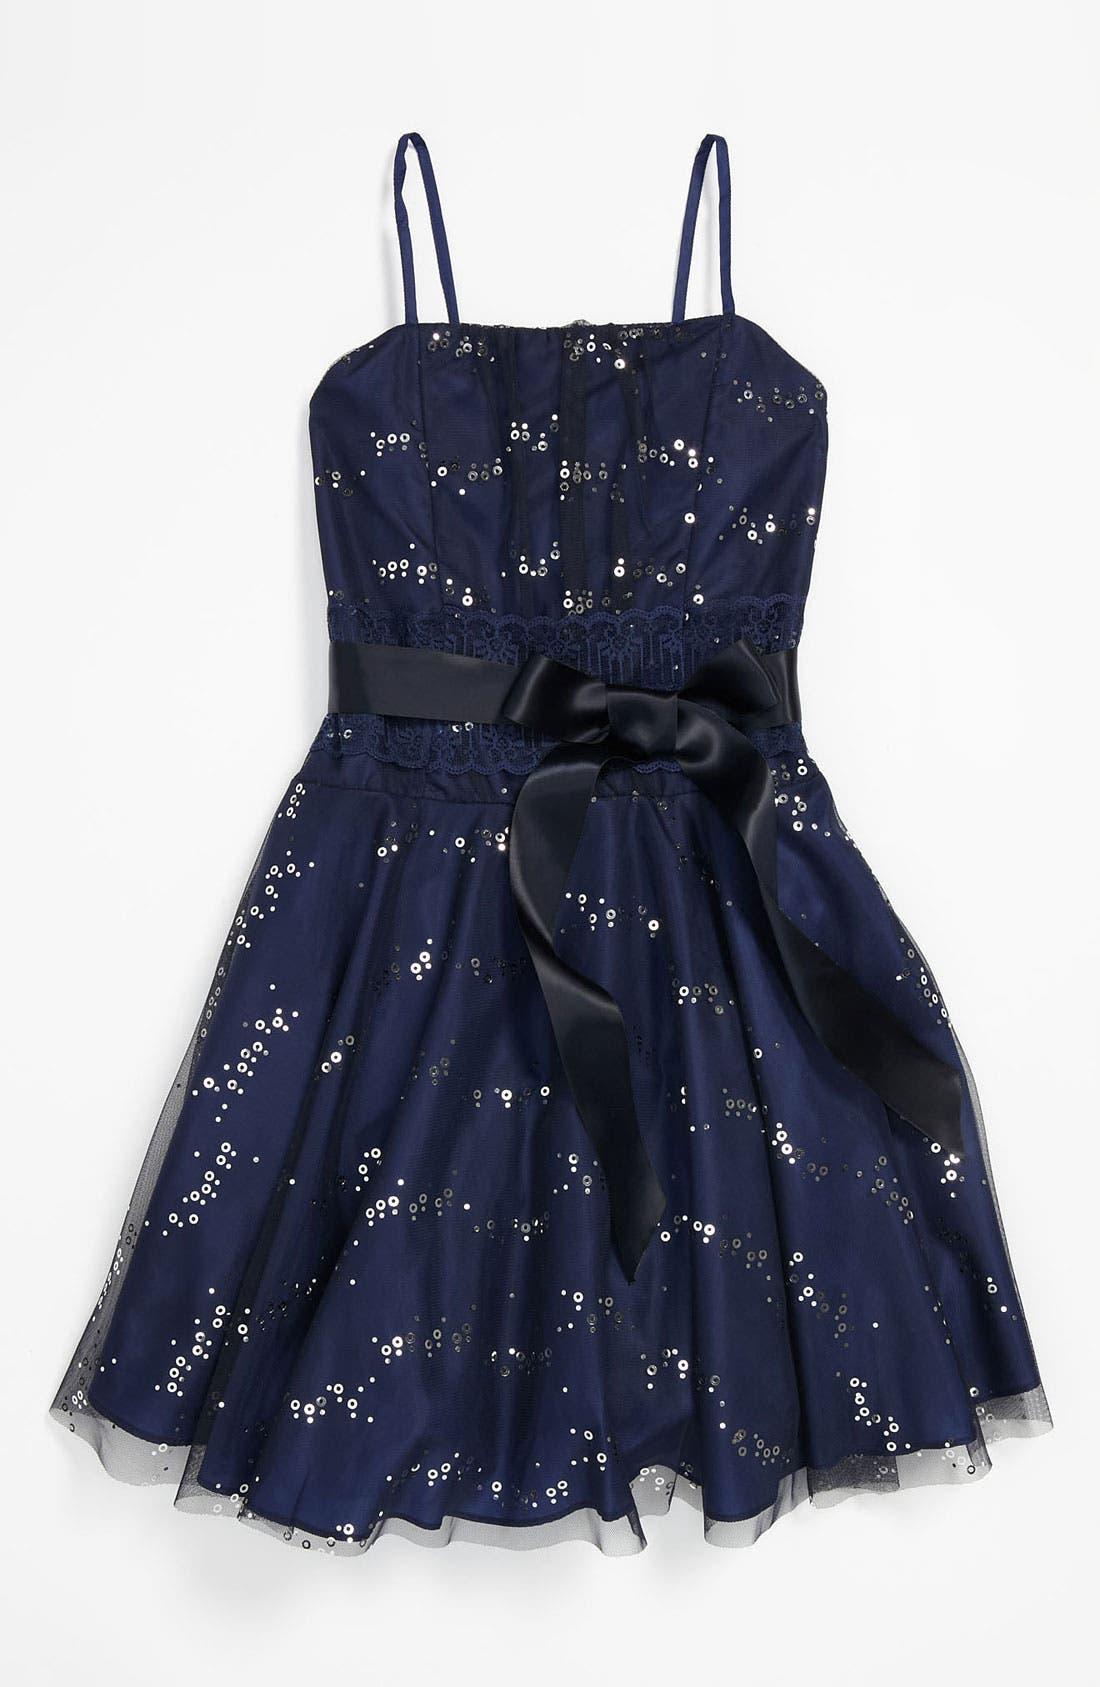 Alternate Image 1 Selected - Dorissa 'Laura' Sequin Dress (Big Girls)